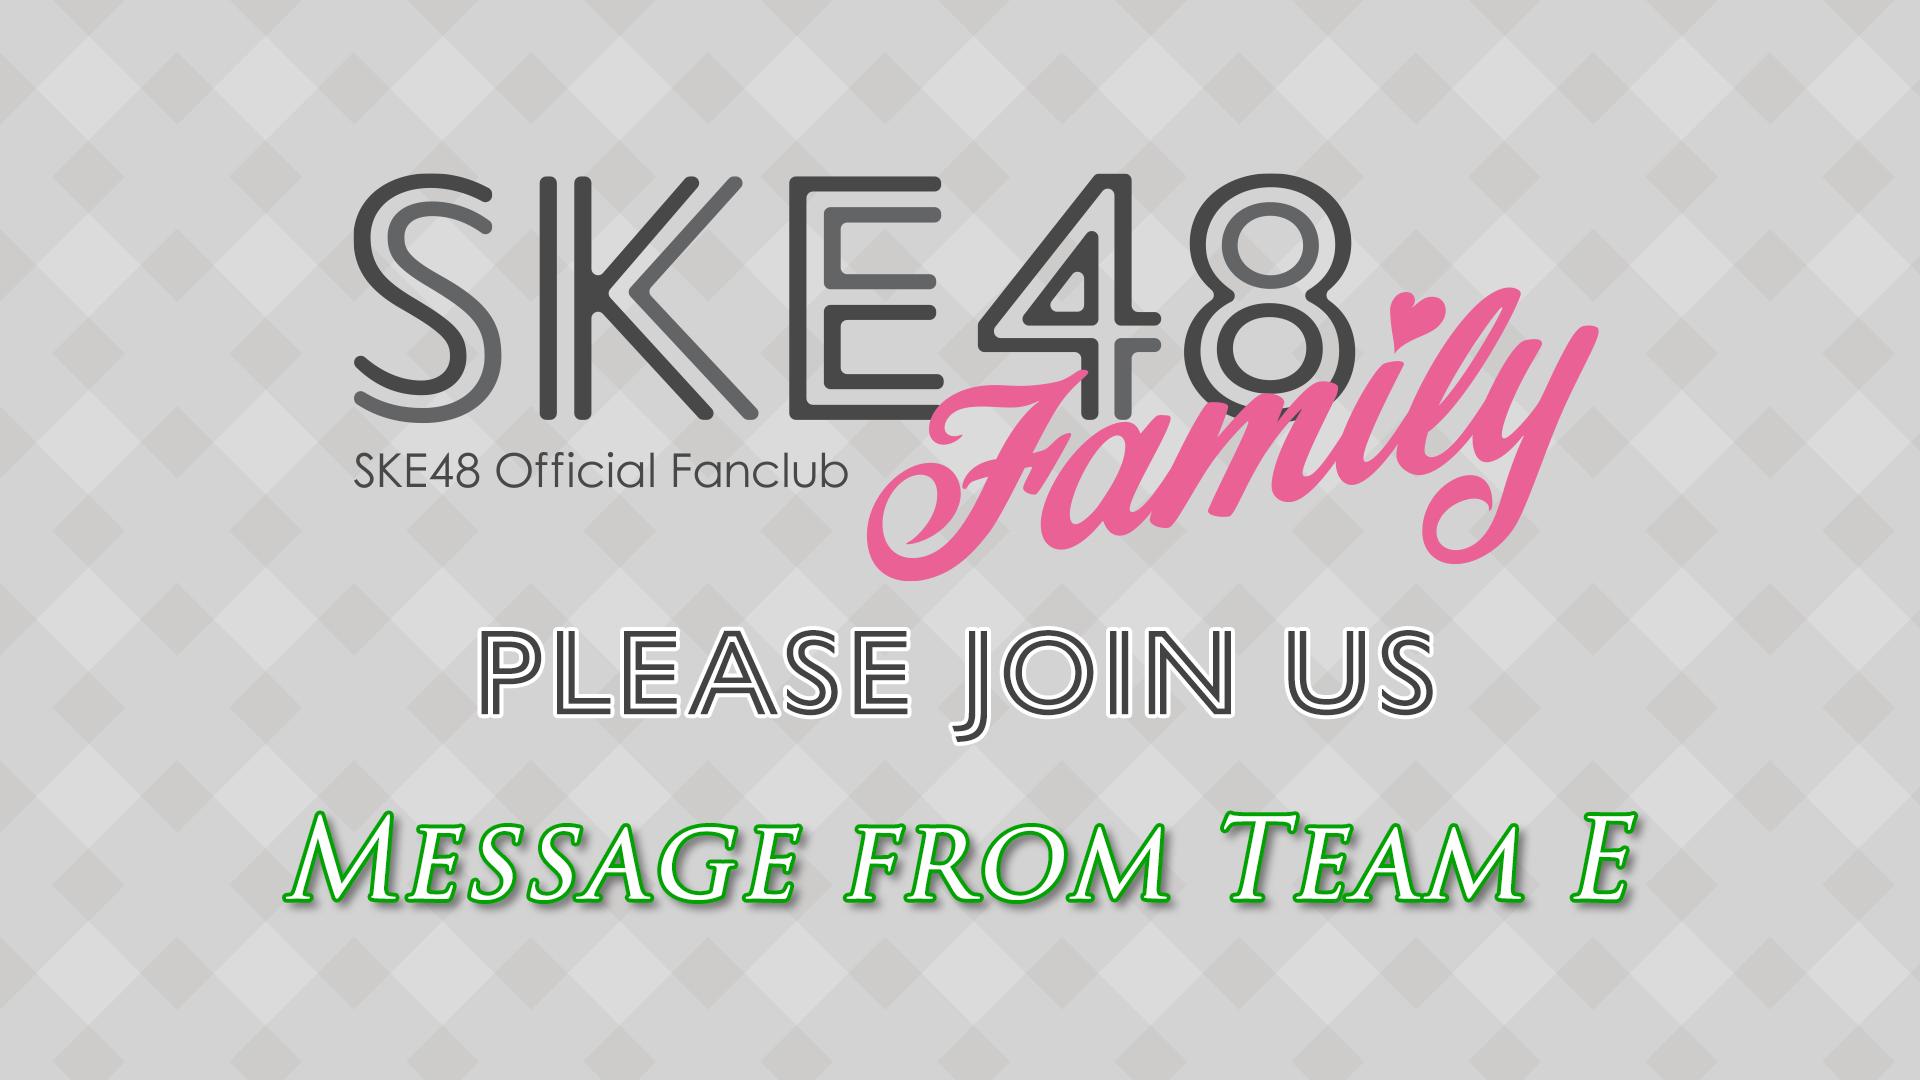 SKE48 Family入会受付中!チームEメンバーからのメッセージをどうぞ